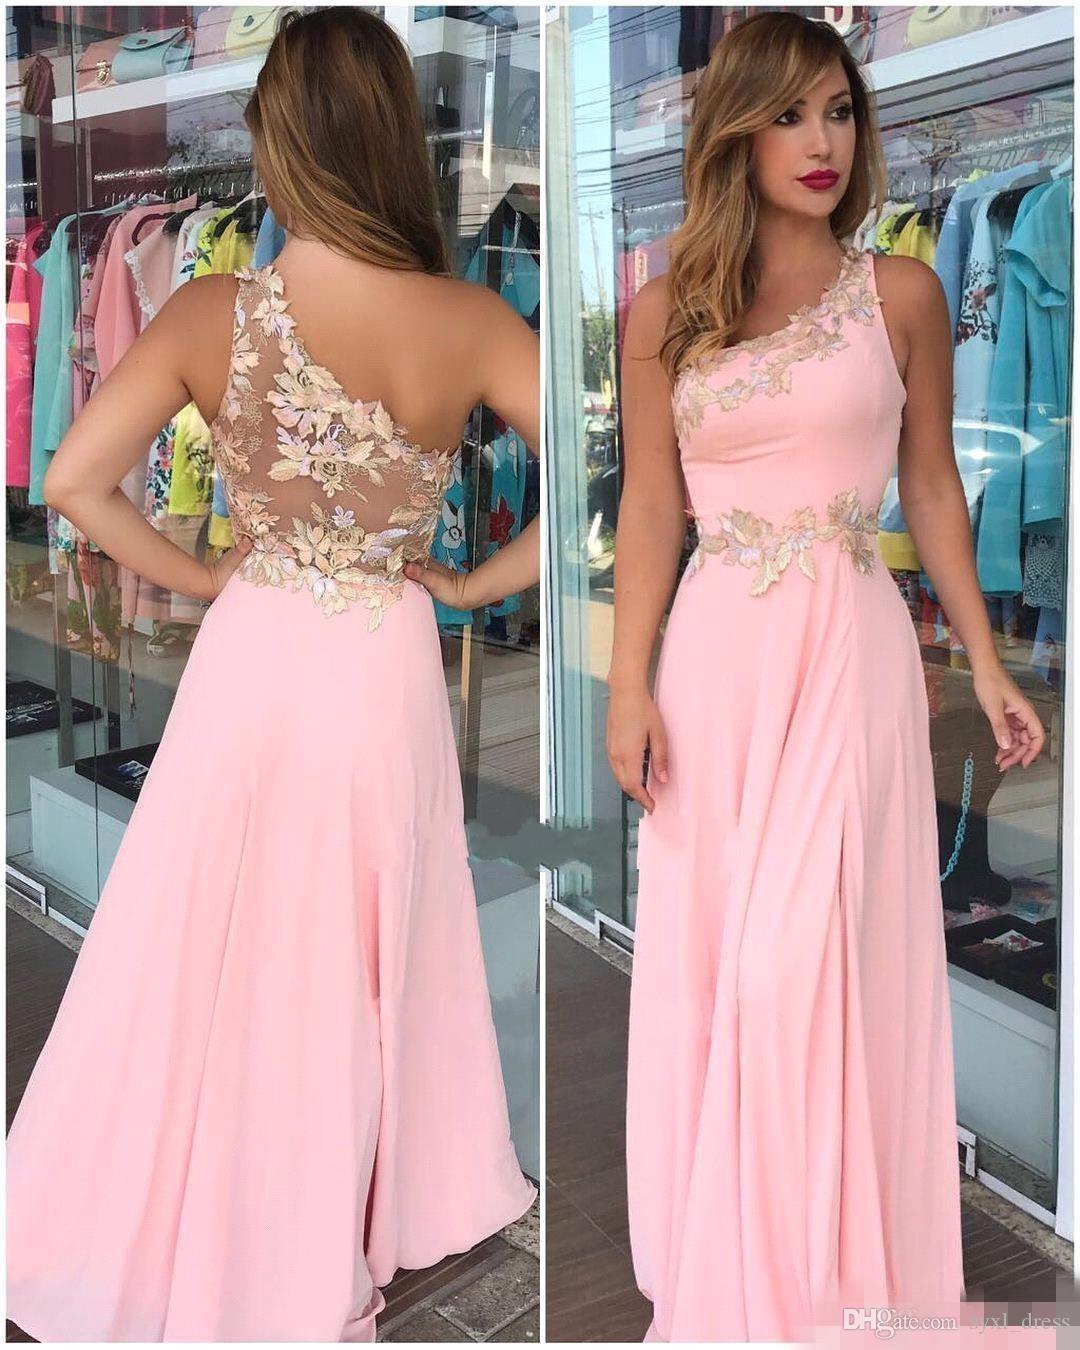 2018 Pink Arabic Dubai Muslim Cheap Prom Dresses Elegant Evening Formal  Dresses Party Wear Abendkleider One Shoulder With Lace Bodycon Party  Dresses Cheap ... d7fb00738fad